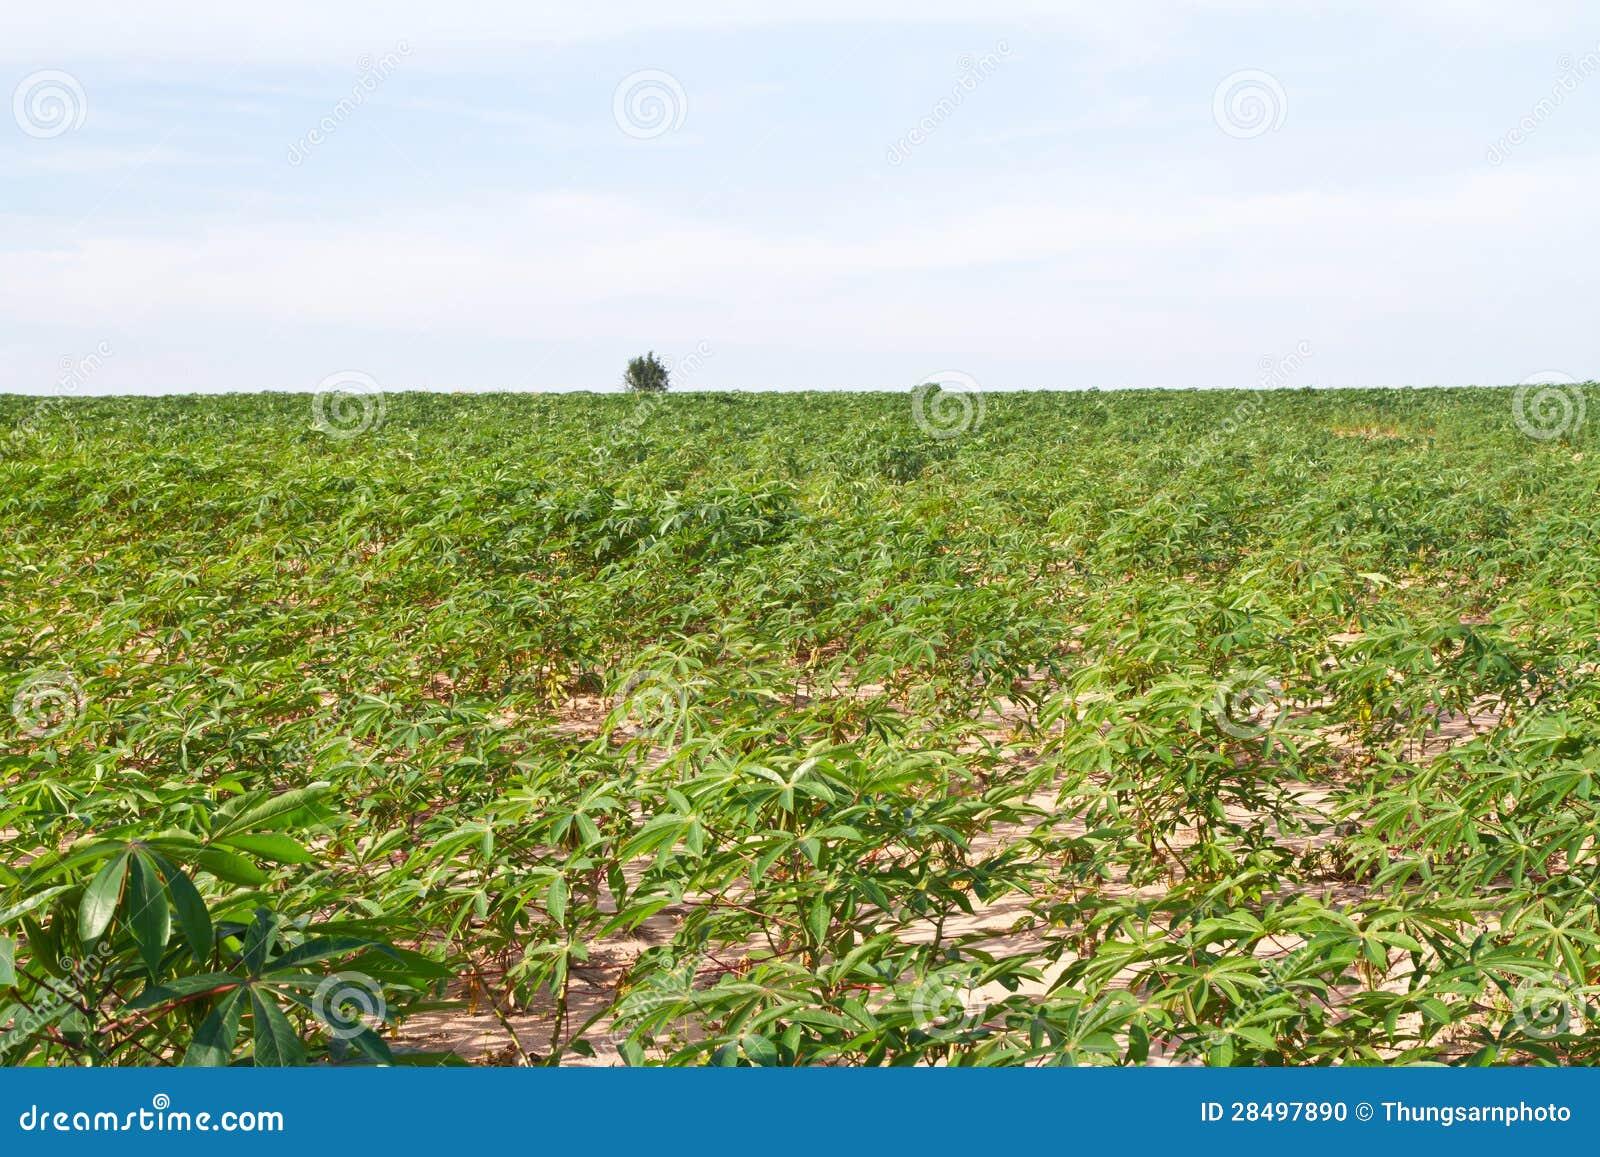 Starting a Potato Farm